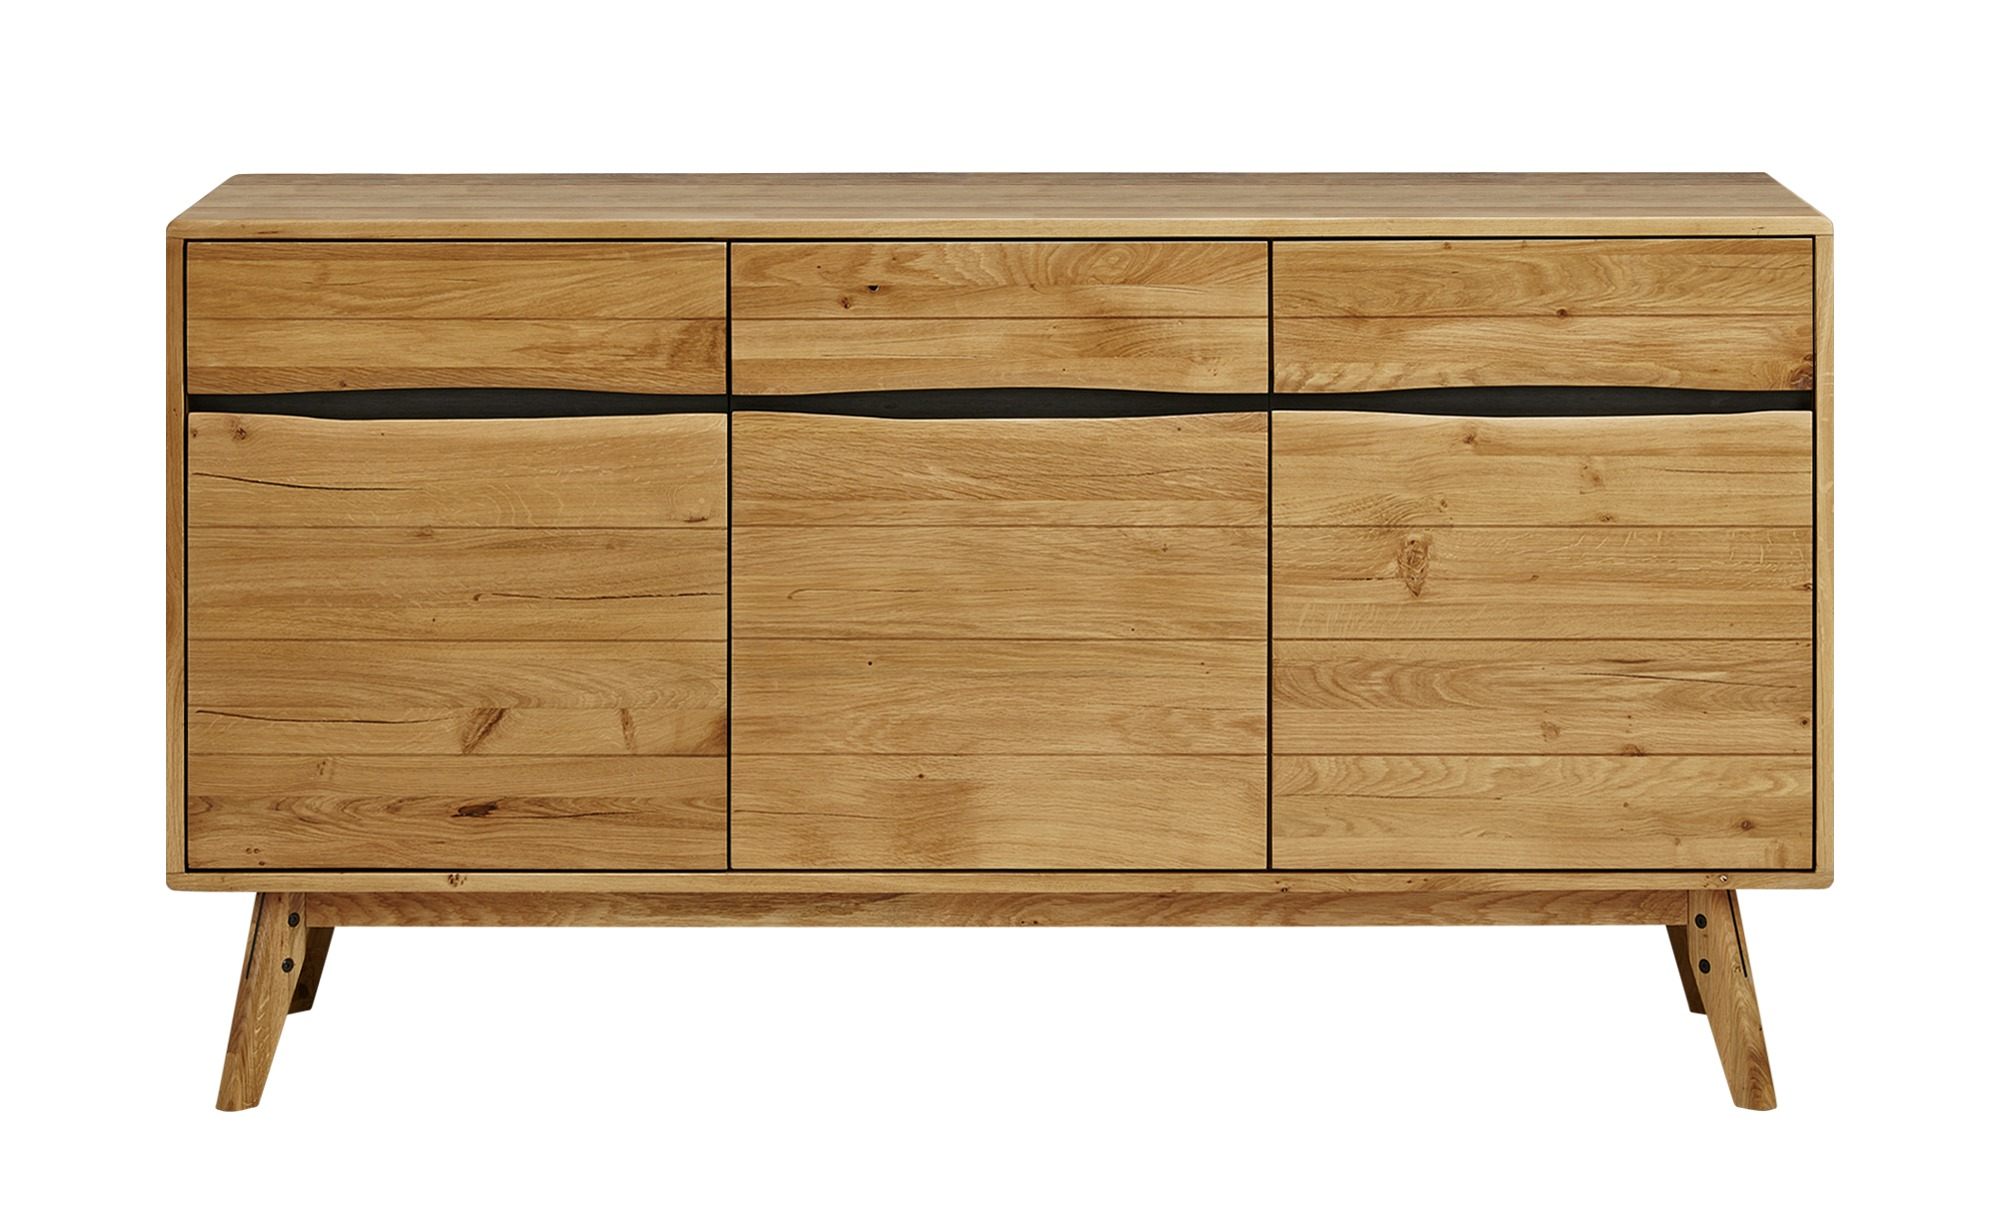 Sideboard Cinnamon Breite 160 Cm Hohe 88 Cm Holzfarben